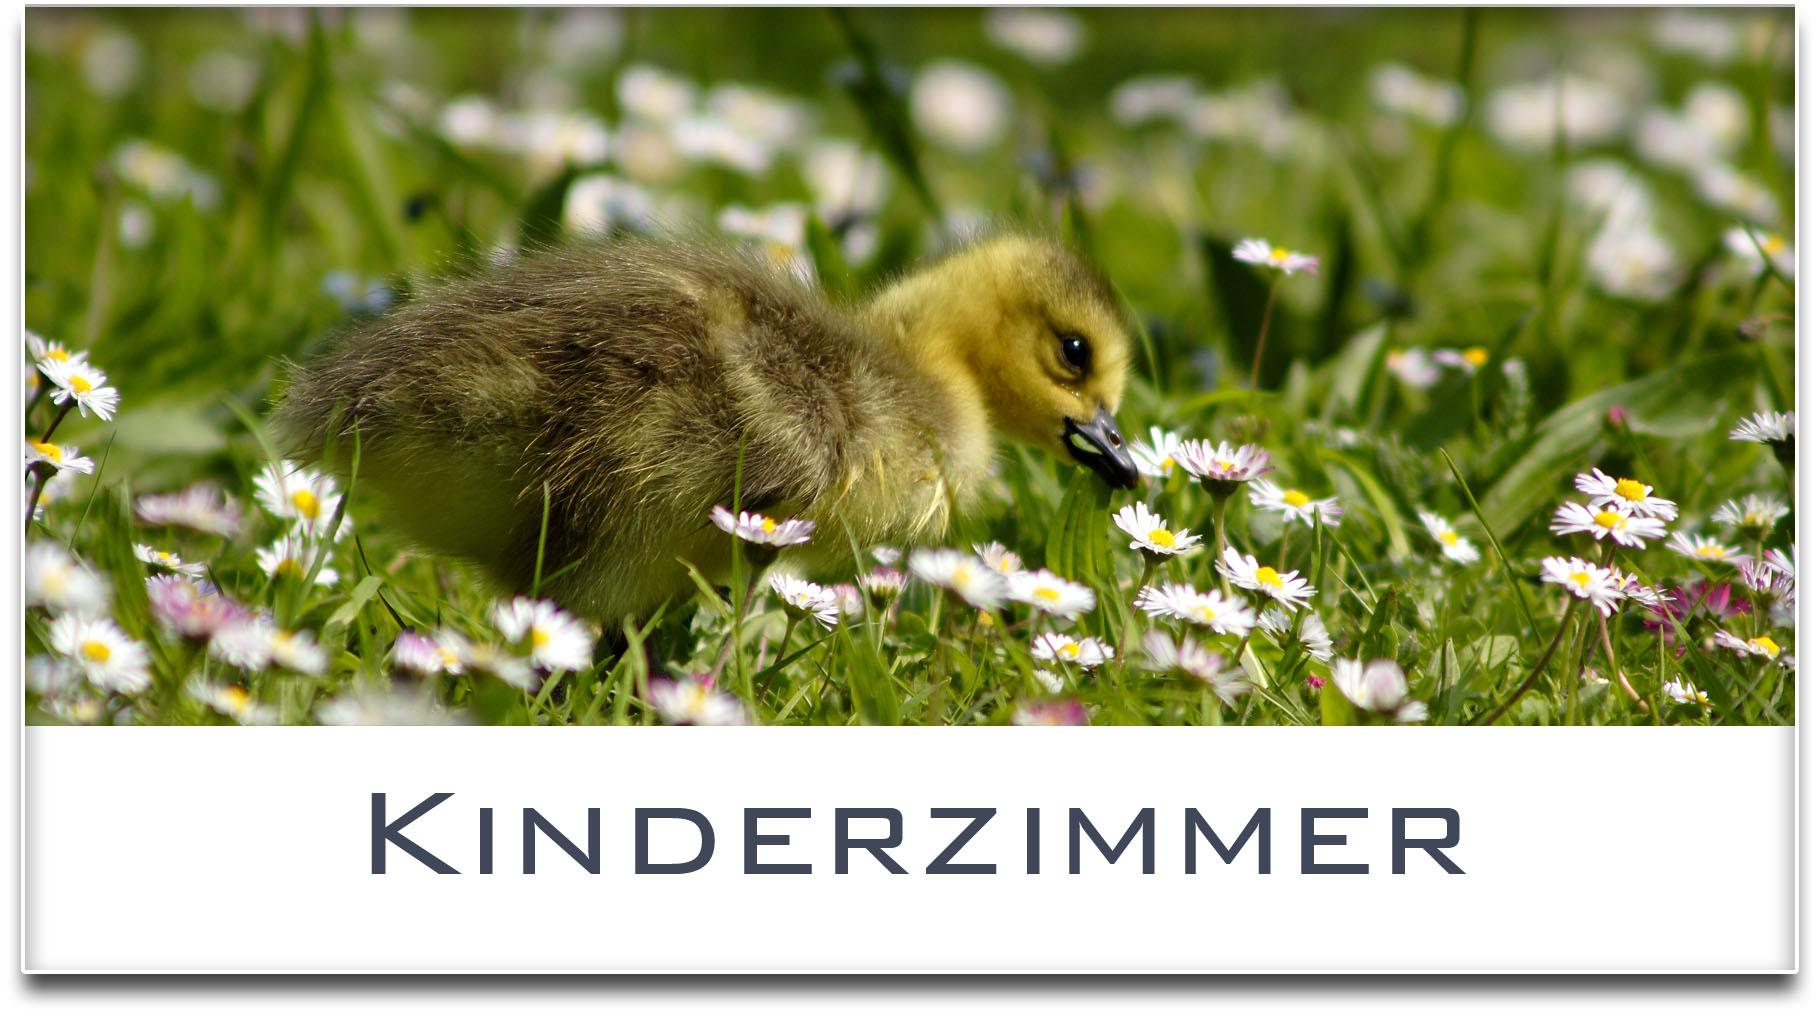 Türschild / Haustürschild / Entenküken / Kinderzimmer / Selbstklebend